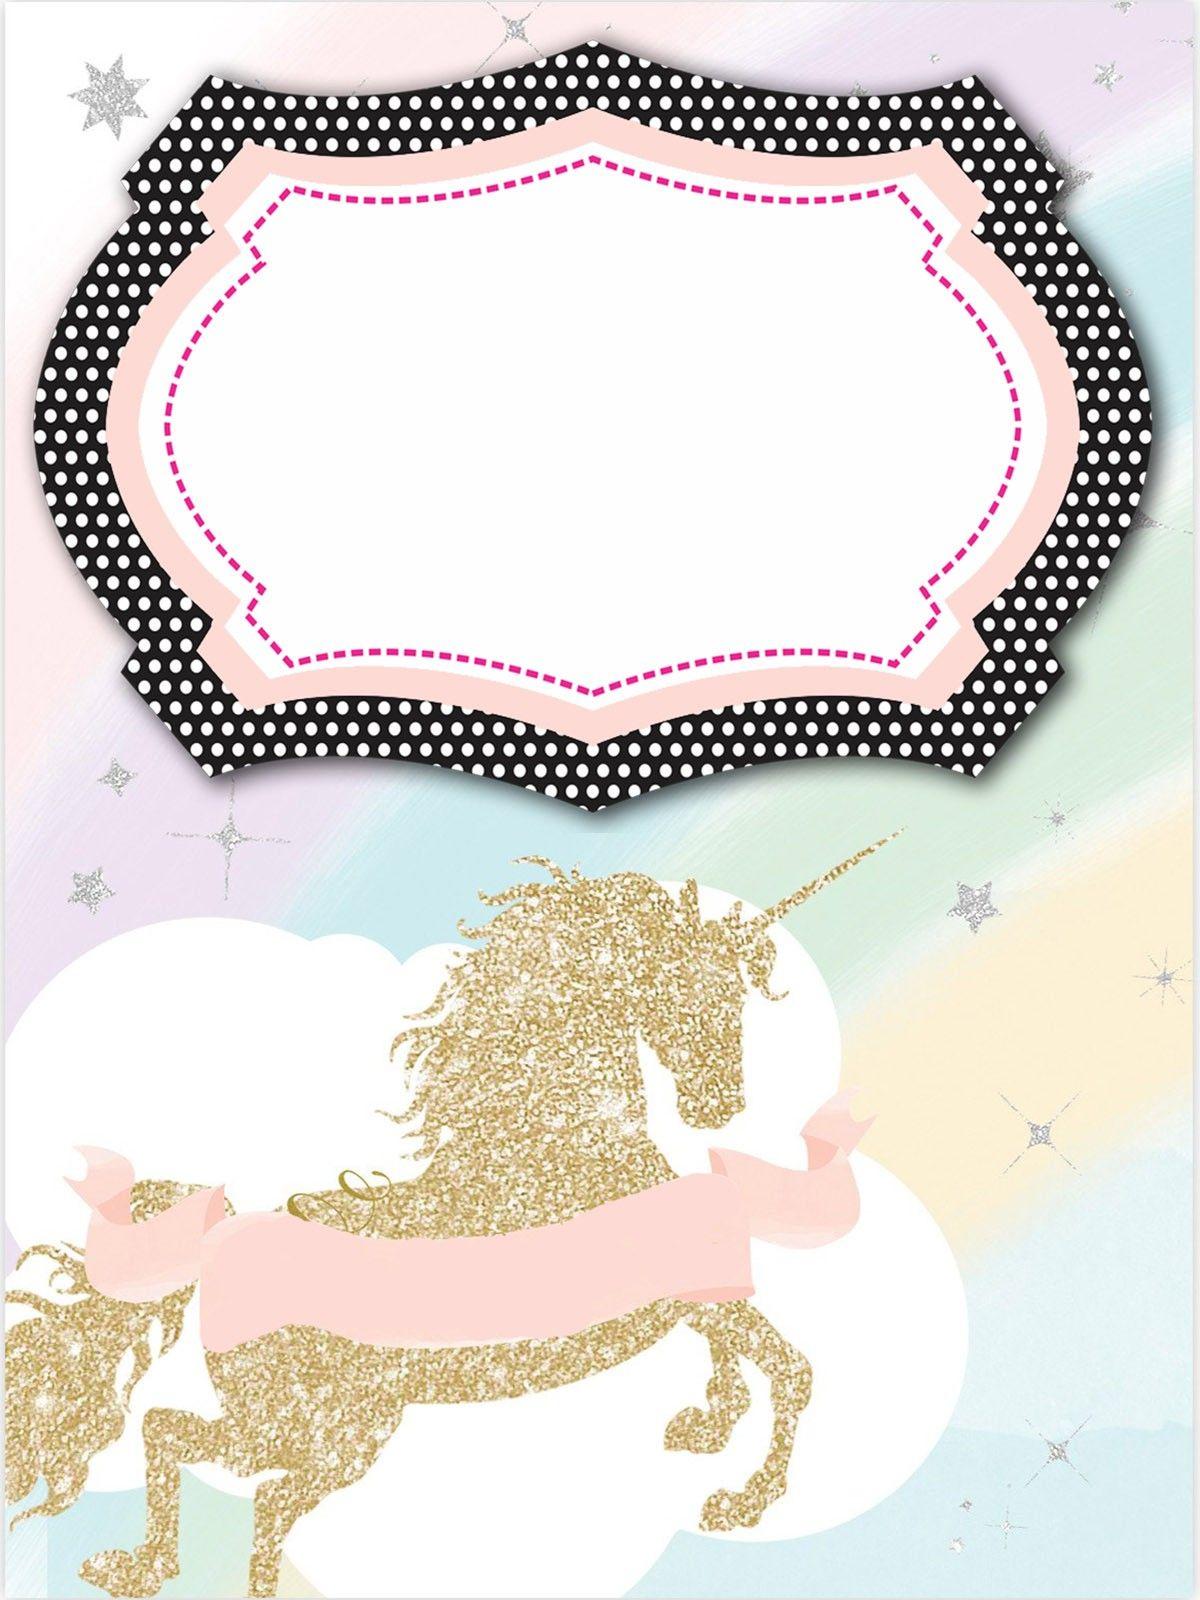 Unicorn Invitation Template Unicorn Invitations Unicorn Birthday Invitations Free Printable Birthday Invitations Girl